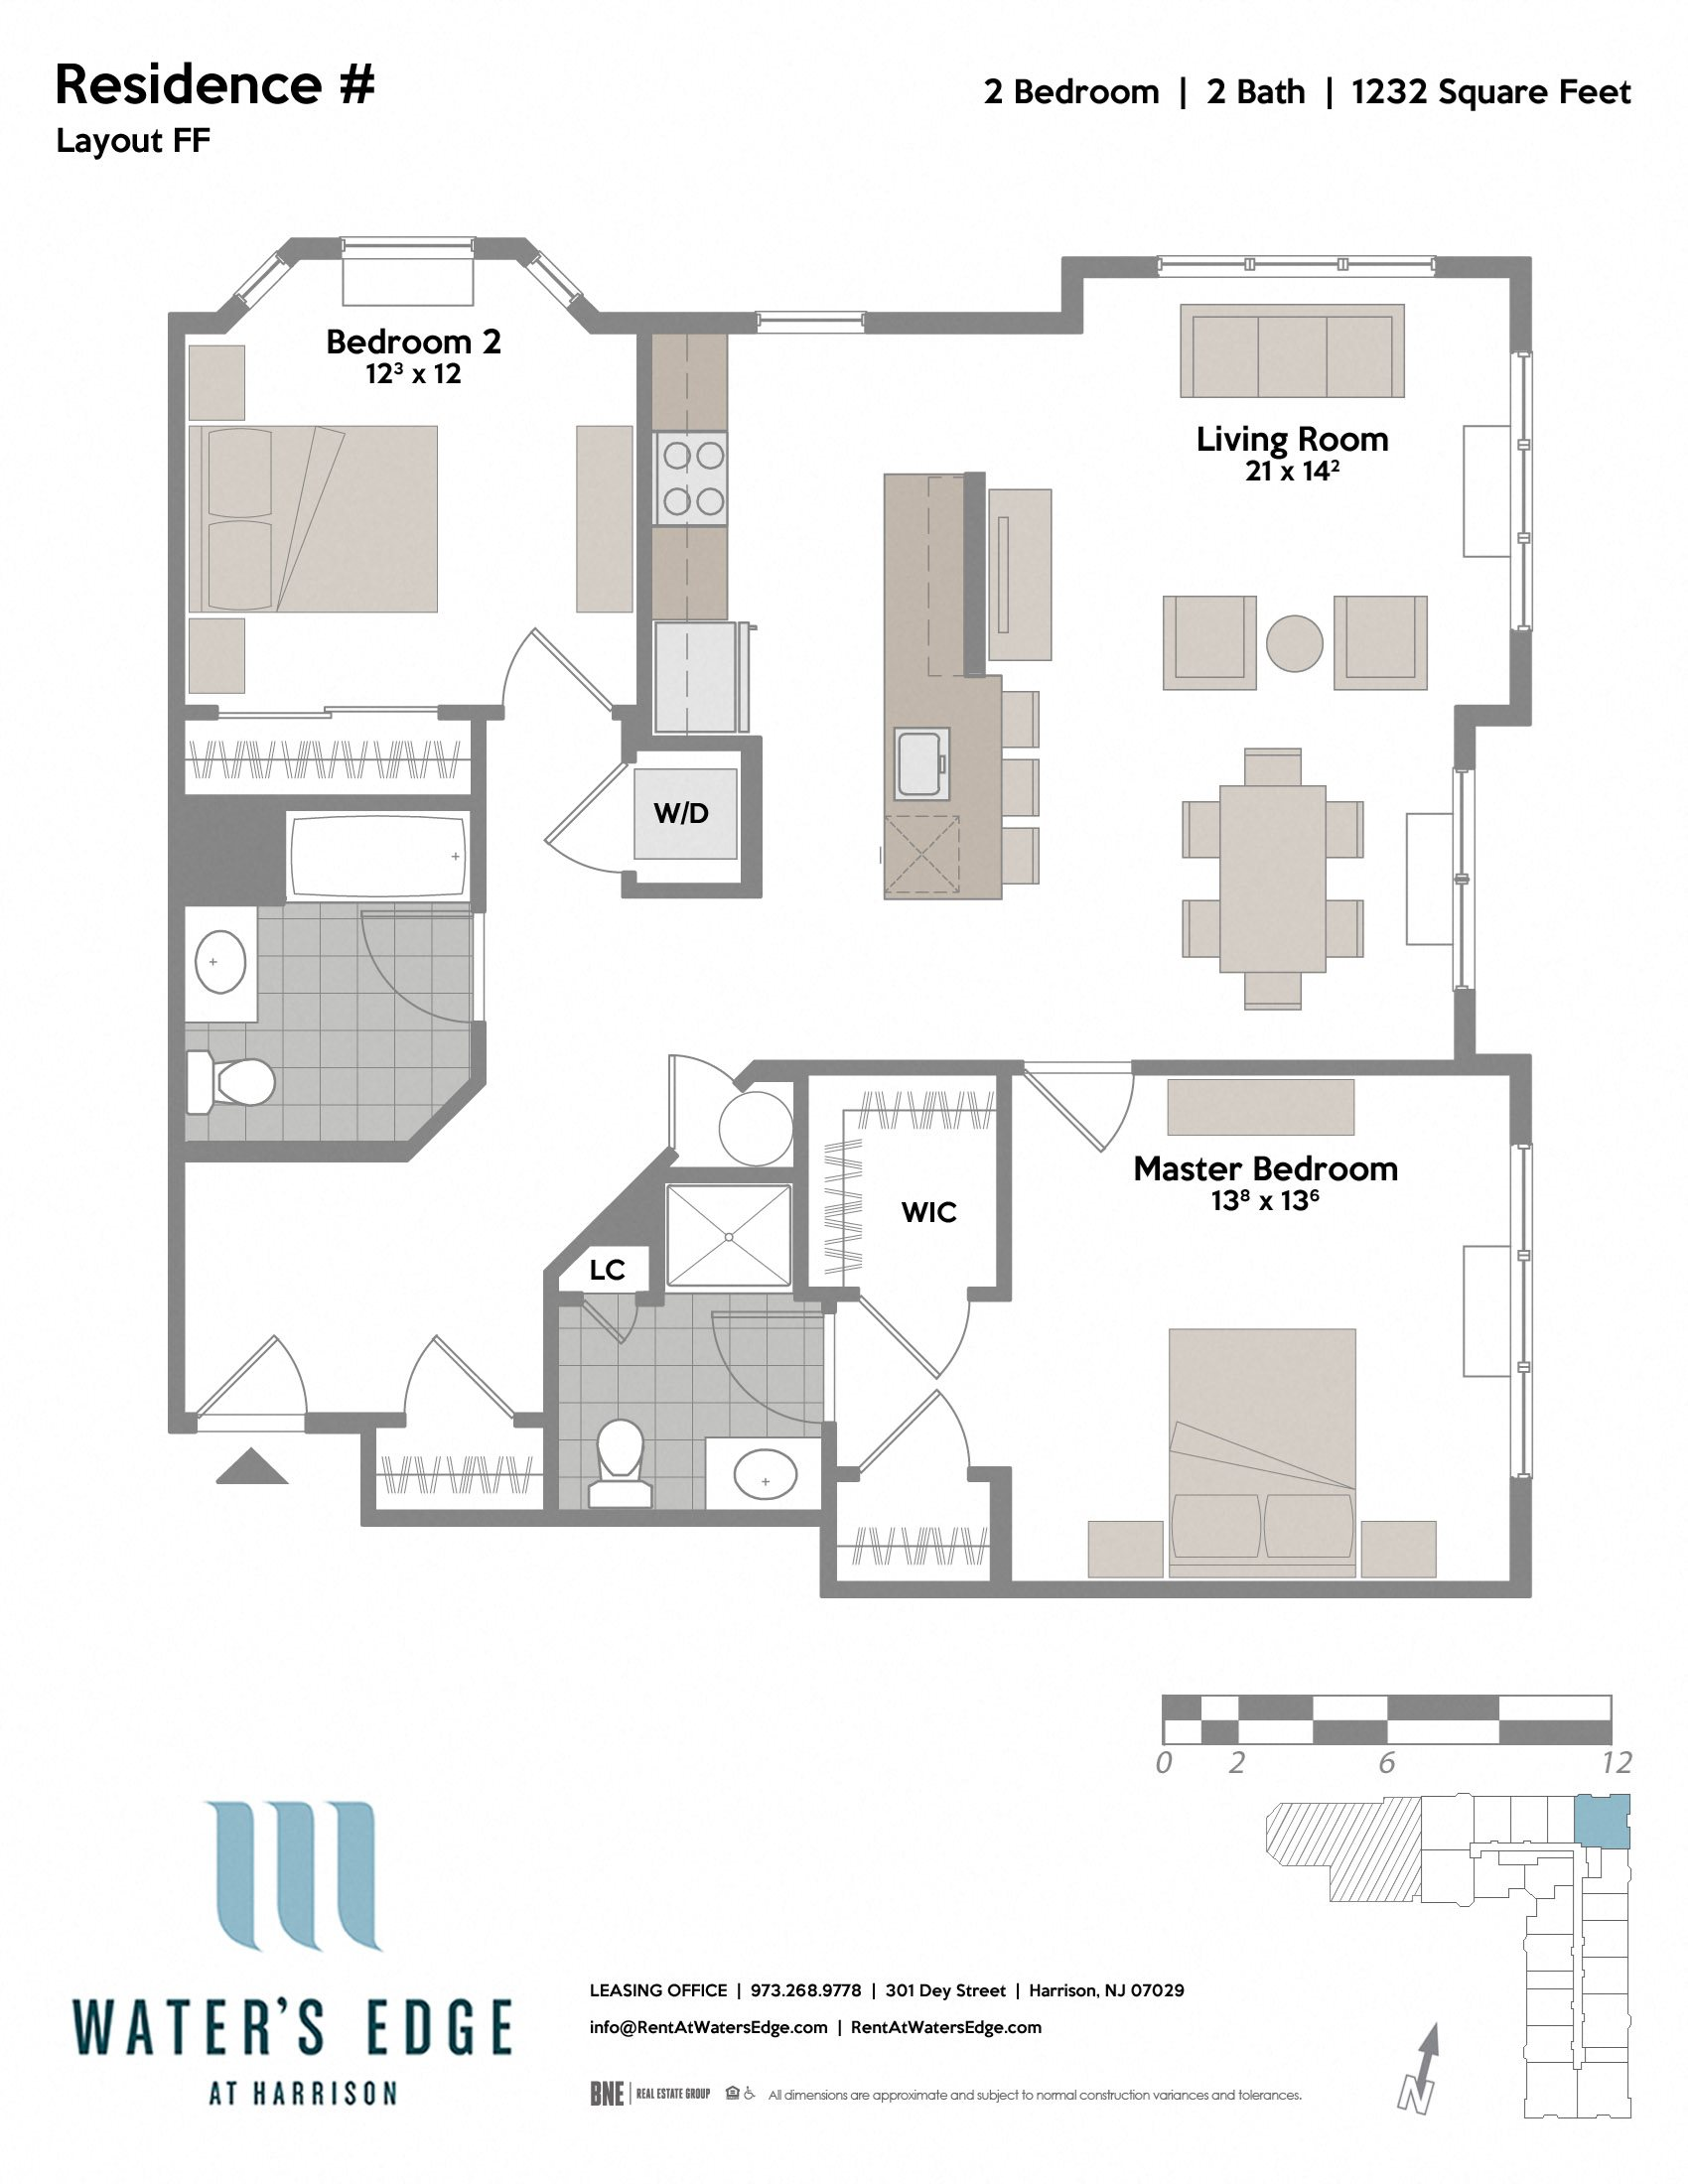 Layout FF Floor Plan 5